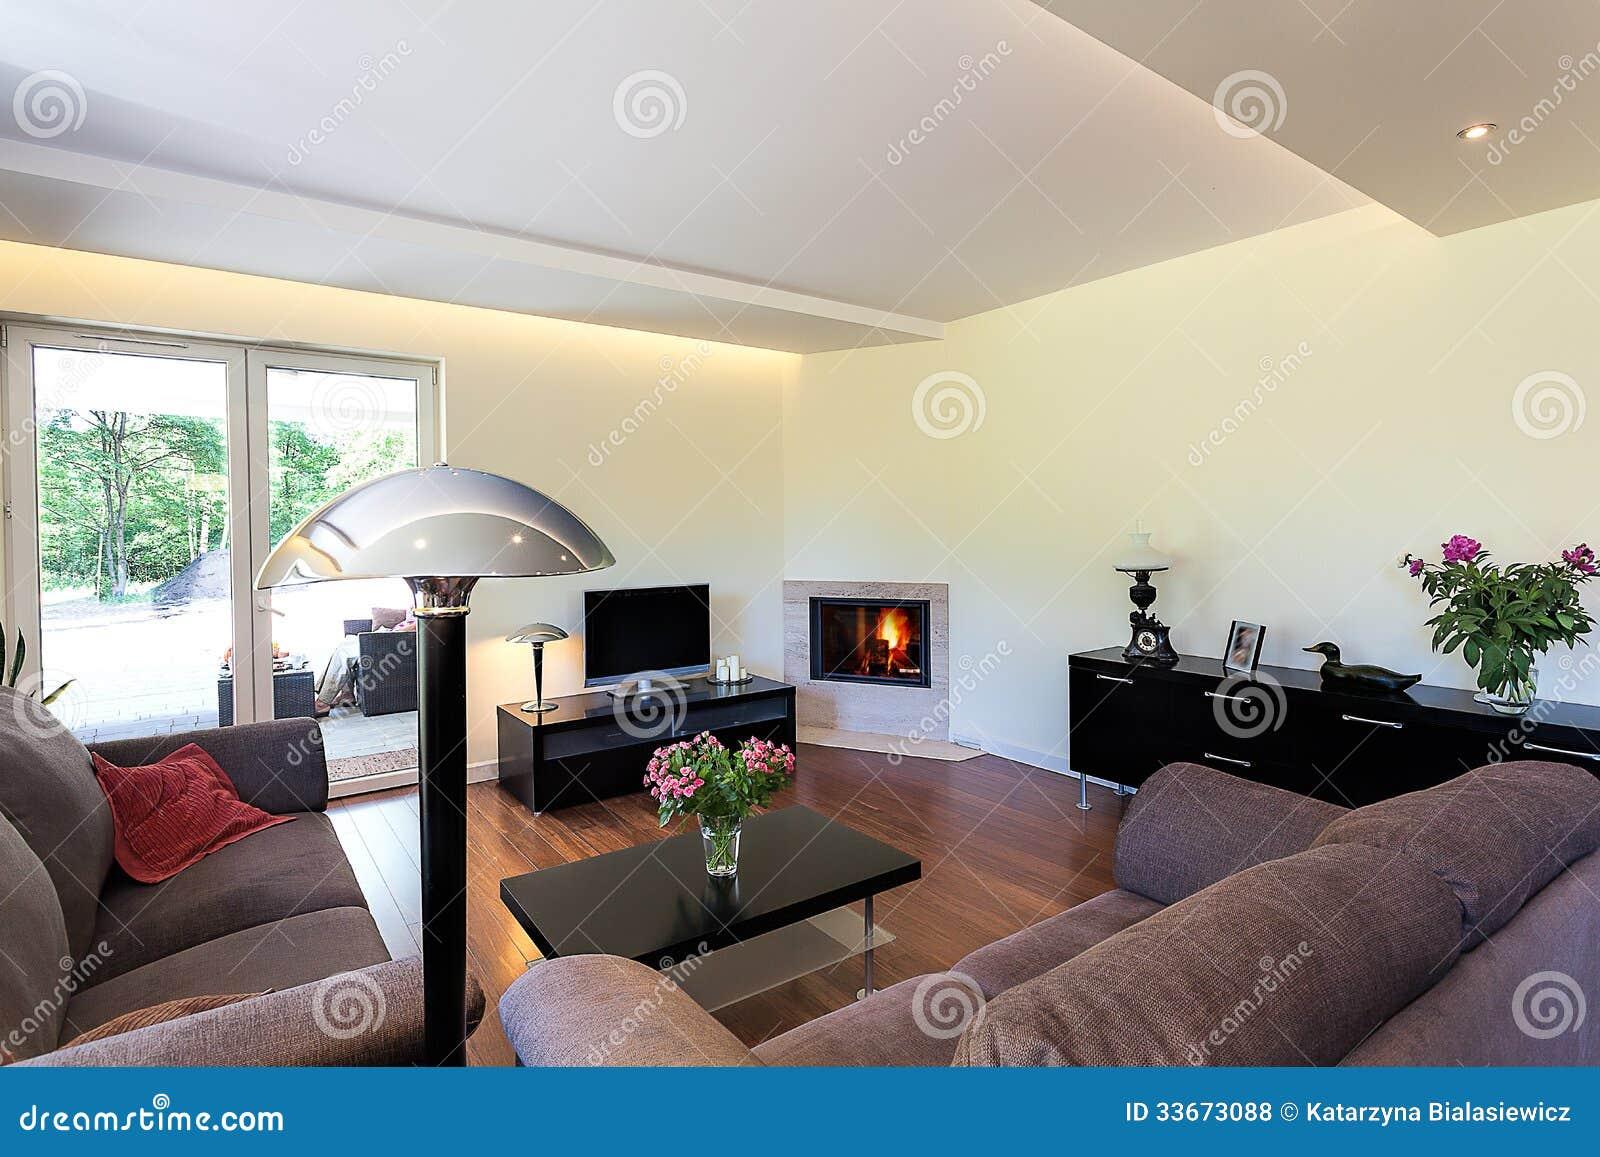 L 39 espace lumineux salon confortable photo stock image for Salon confortable